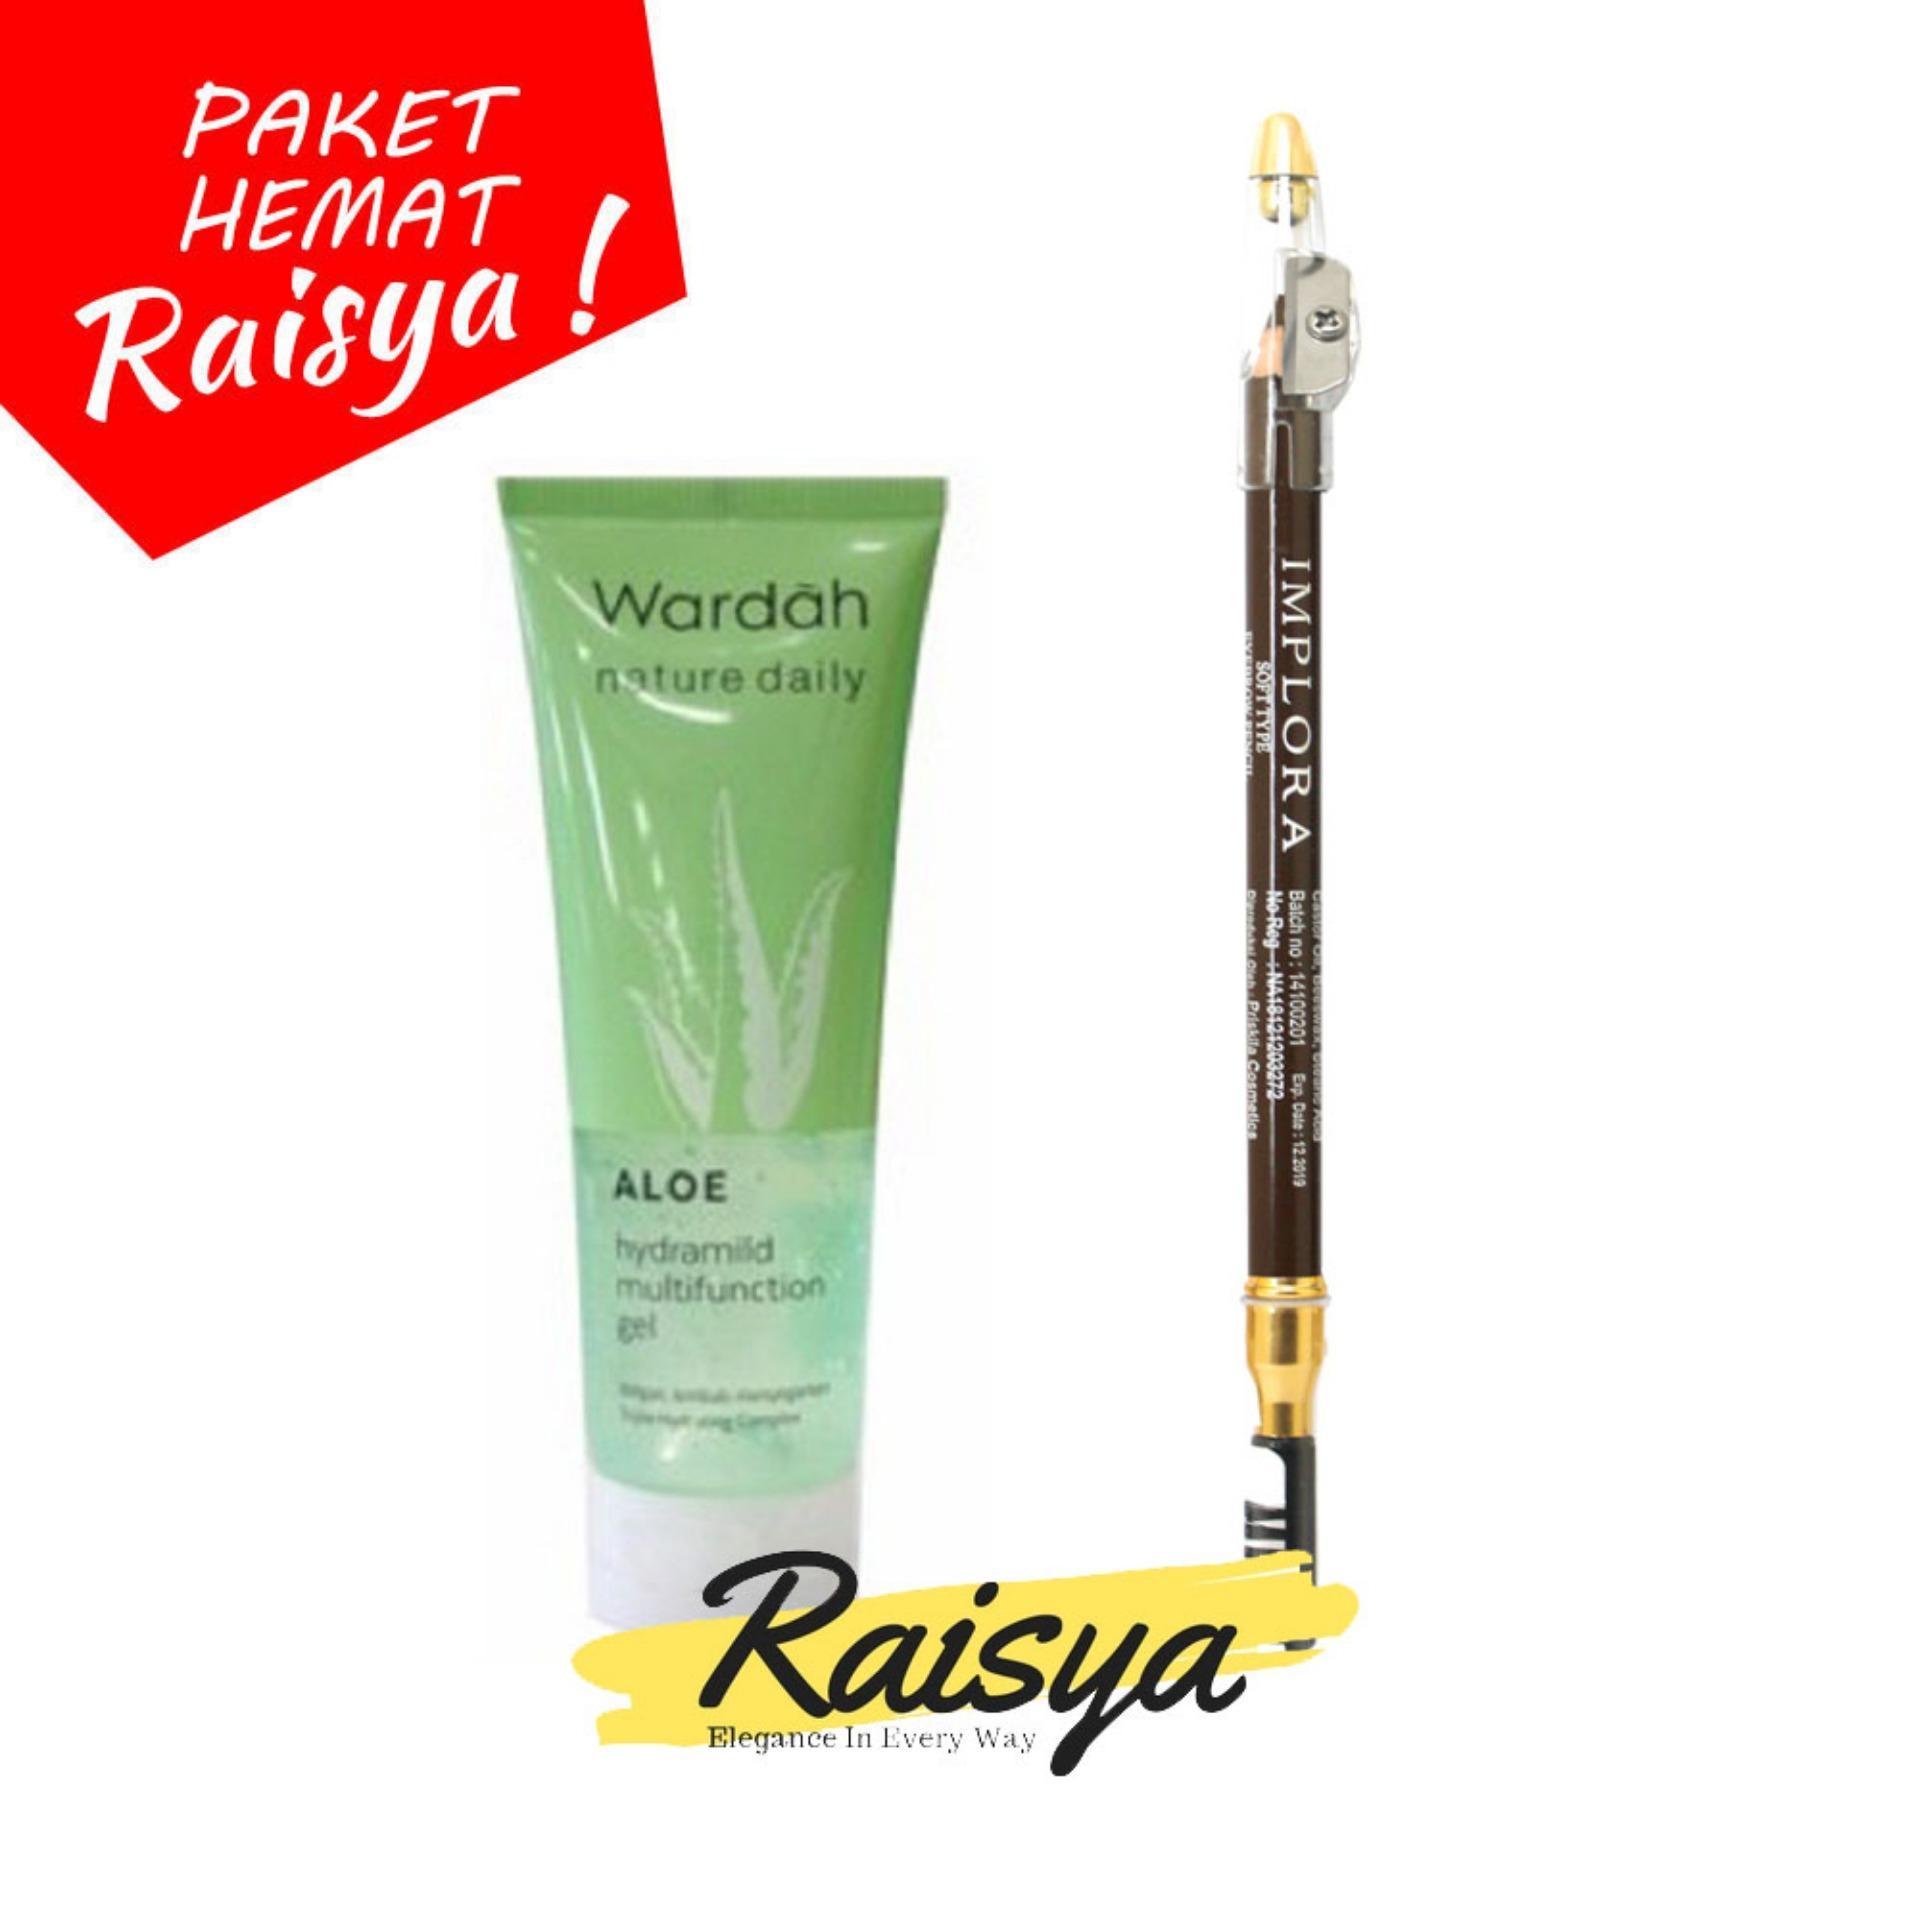 Wardah Hydrating Aloe Vera Gel Free Implora Pensil Alis Coklat Resmi BPOM